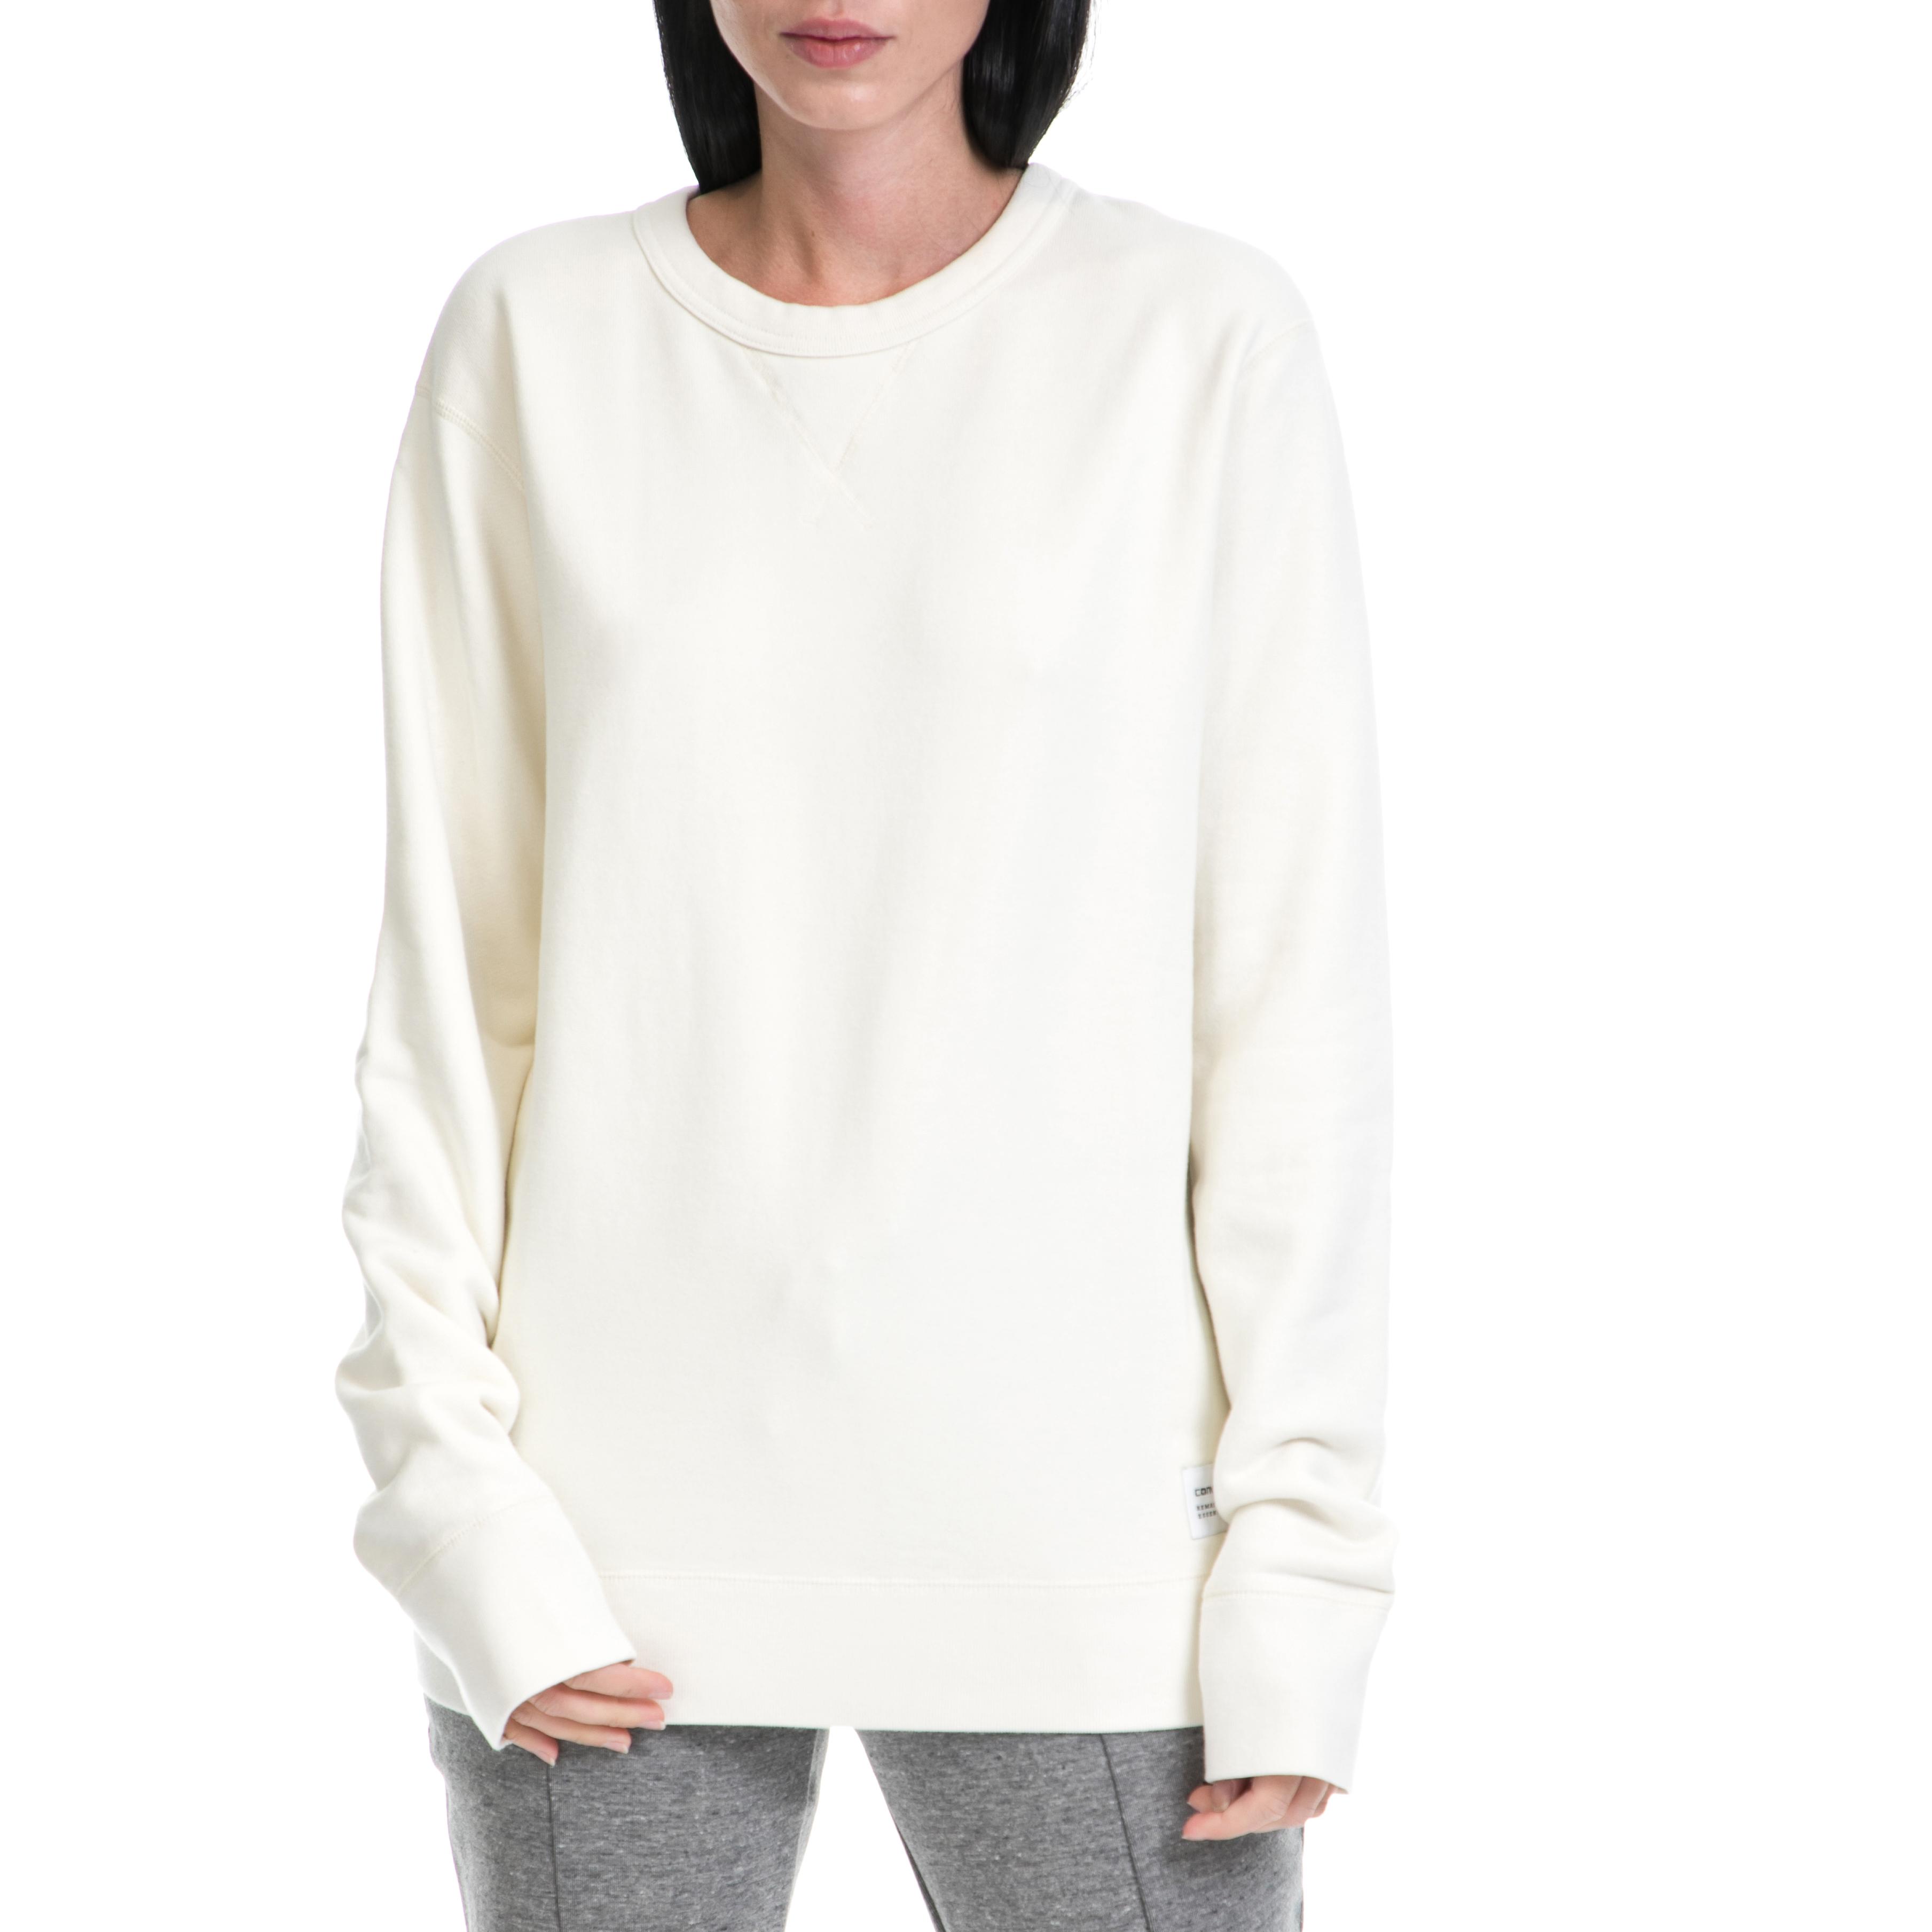 CONVERSE - Γυναικεία μπλούζα φούτερ Converse Essentials Crew λευκή γυναικεία ρούχα αθλητικά φούτερ μακρυμάνικα